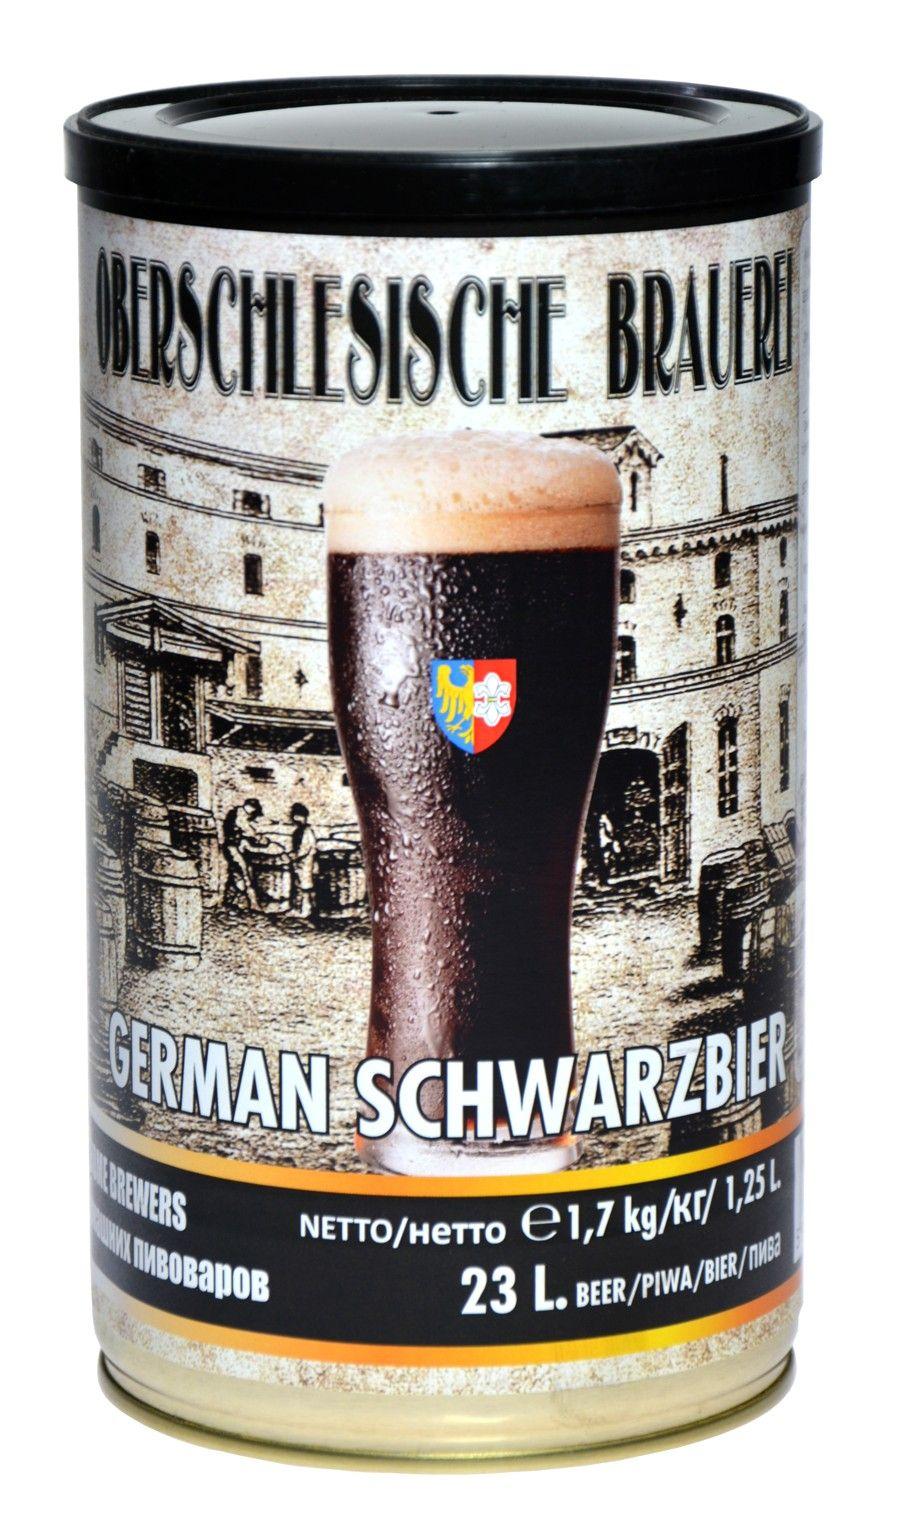 пиво Германий SCHWARZBIER +дрожжи солод пивоварение 23L